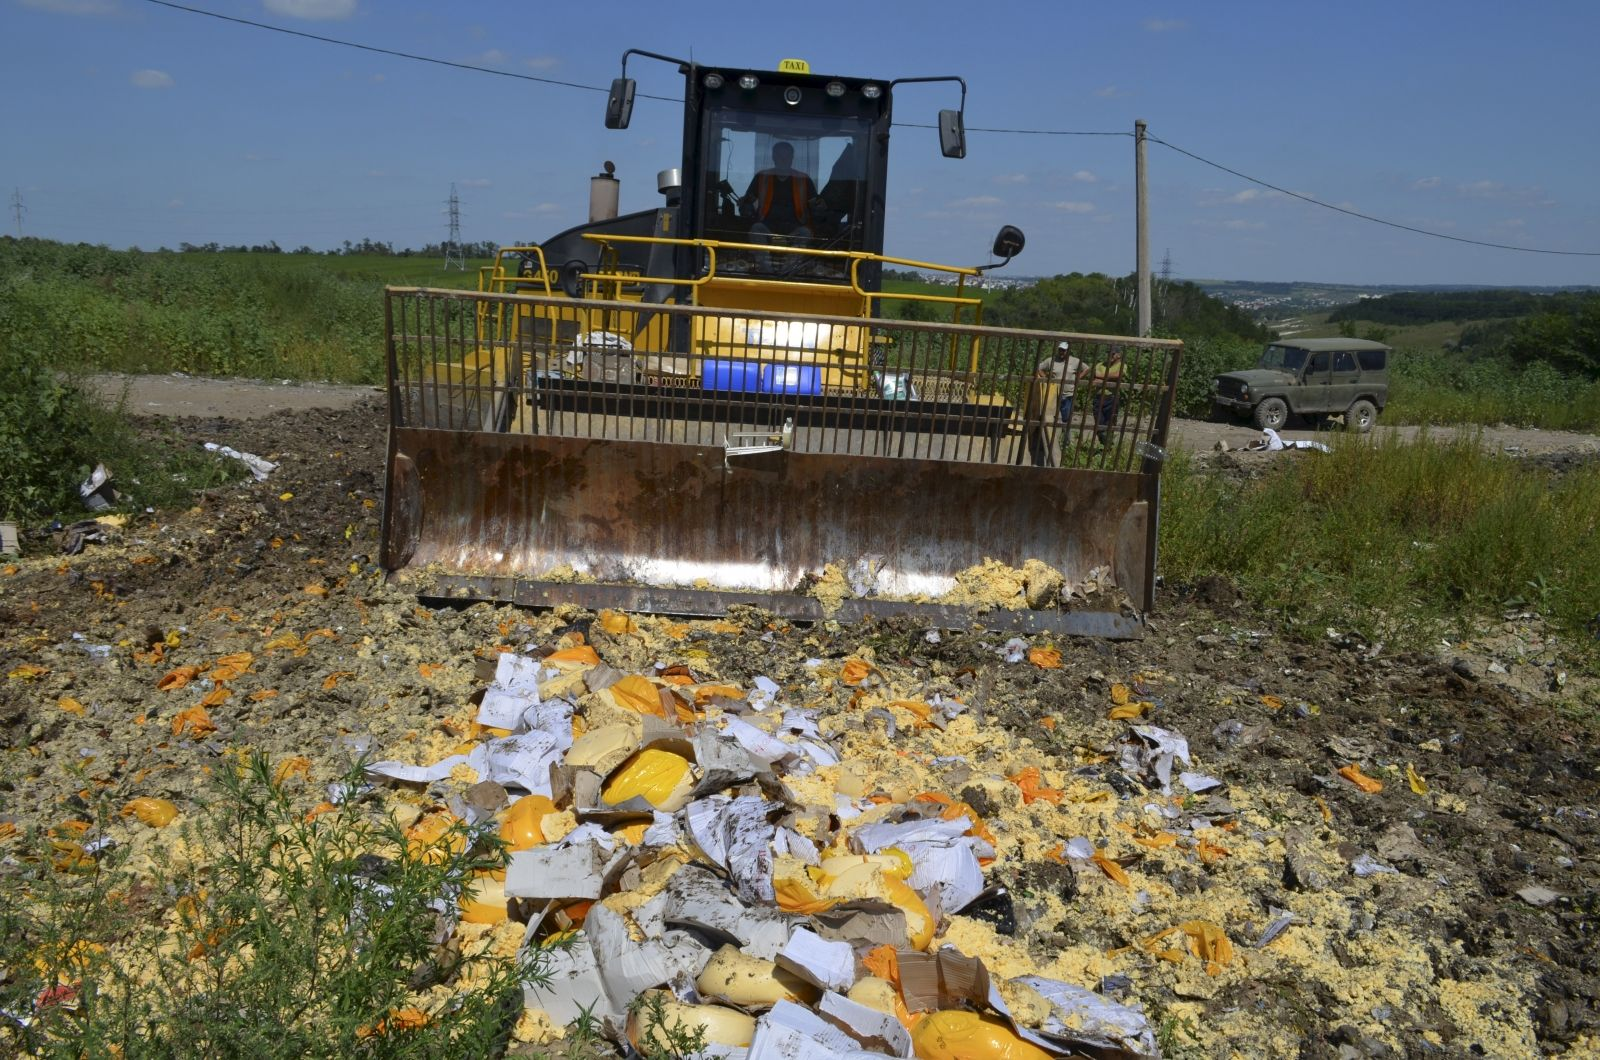 Group challenges Putin over food destruction